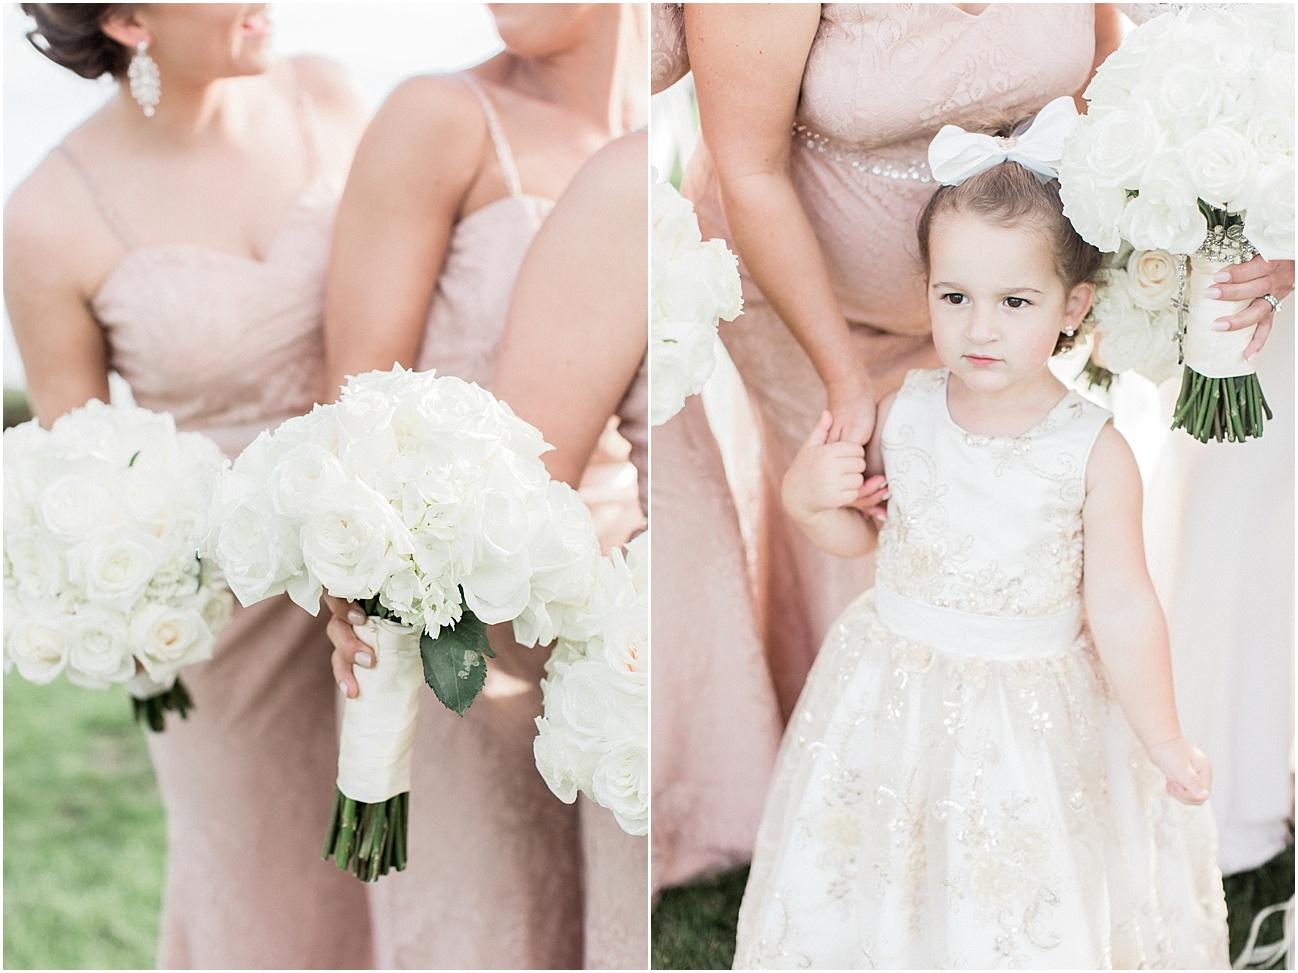 bianca_chris_danversport_italian_blush_gold_north_shore_cape_cod_boston_wedding_photographer_meredith_jane_photography_photo_1123.jpg